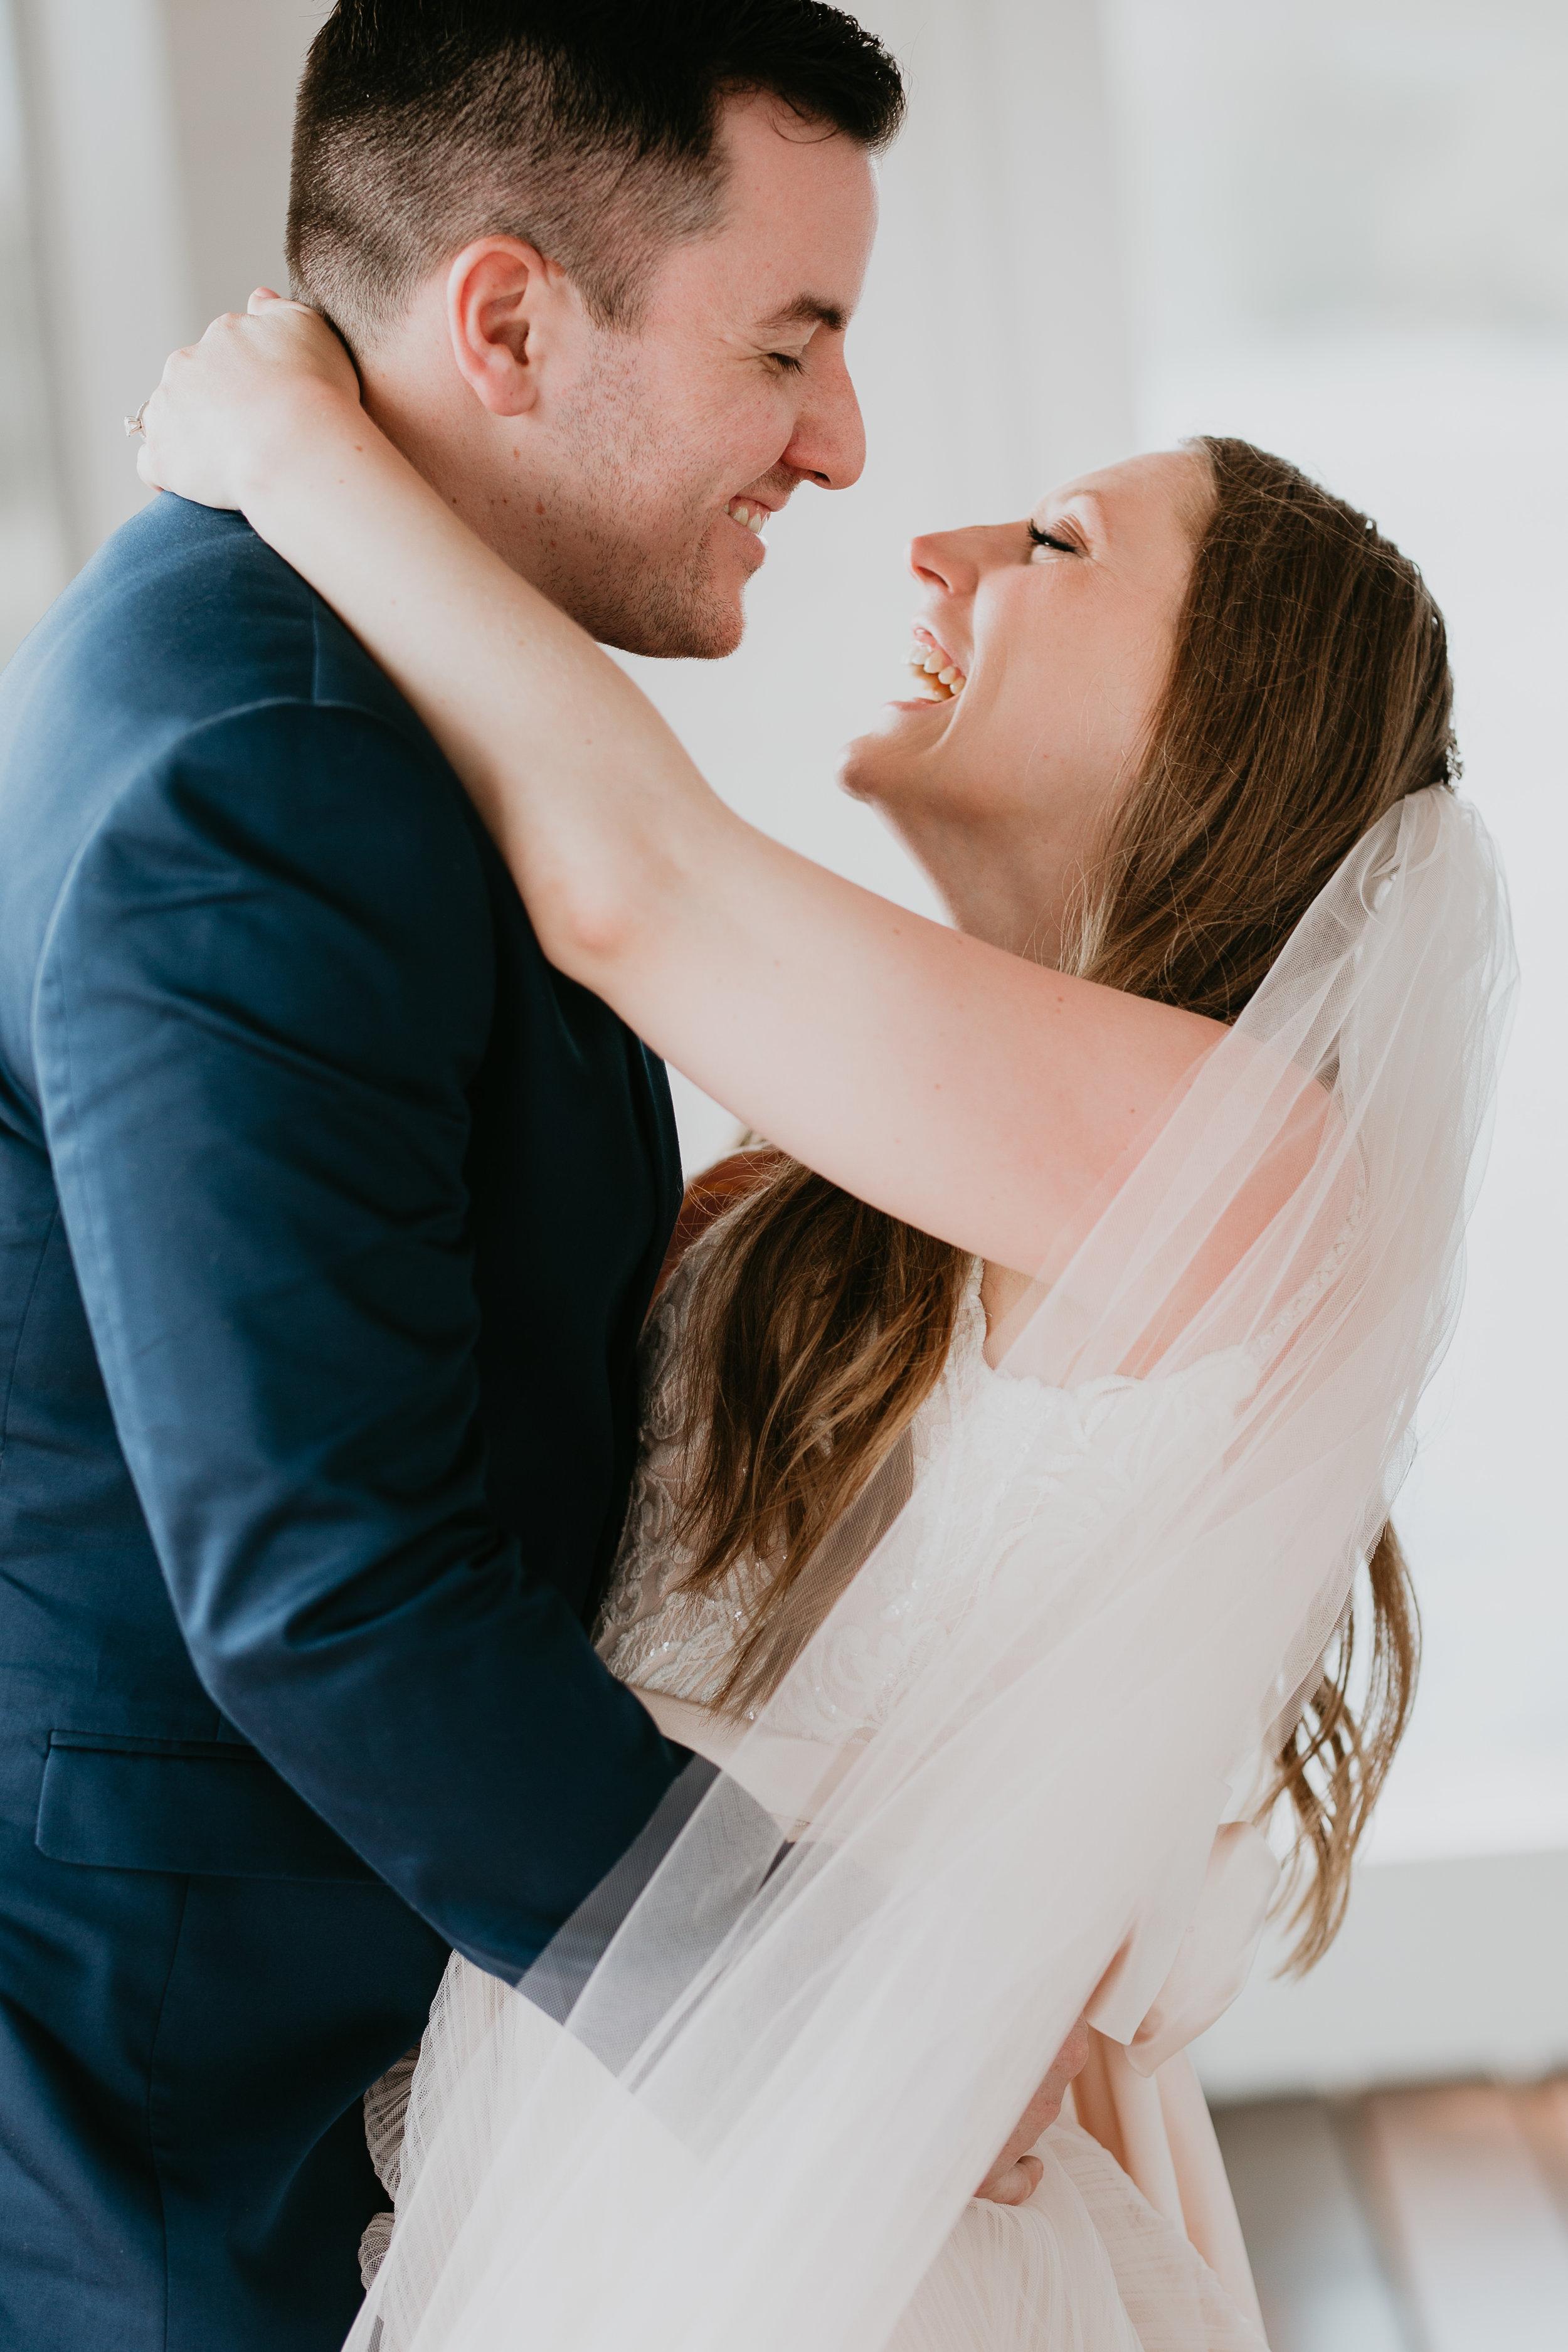 nicole-daacke-photography-destination-wedding-in-st-lucia-sandals-la-toc-intimate-island-wedding-carribean-elopement-photographer-chill-island-wedding-36.jpg